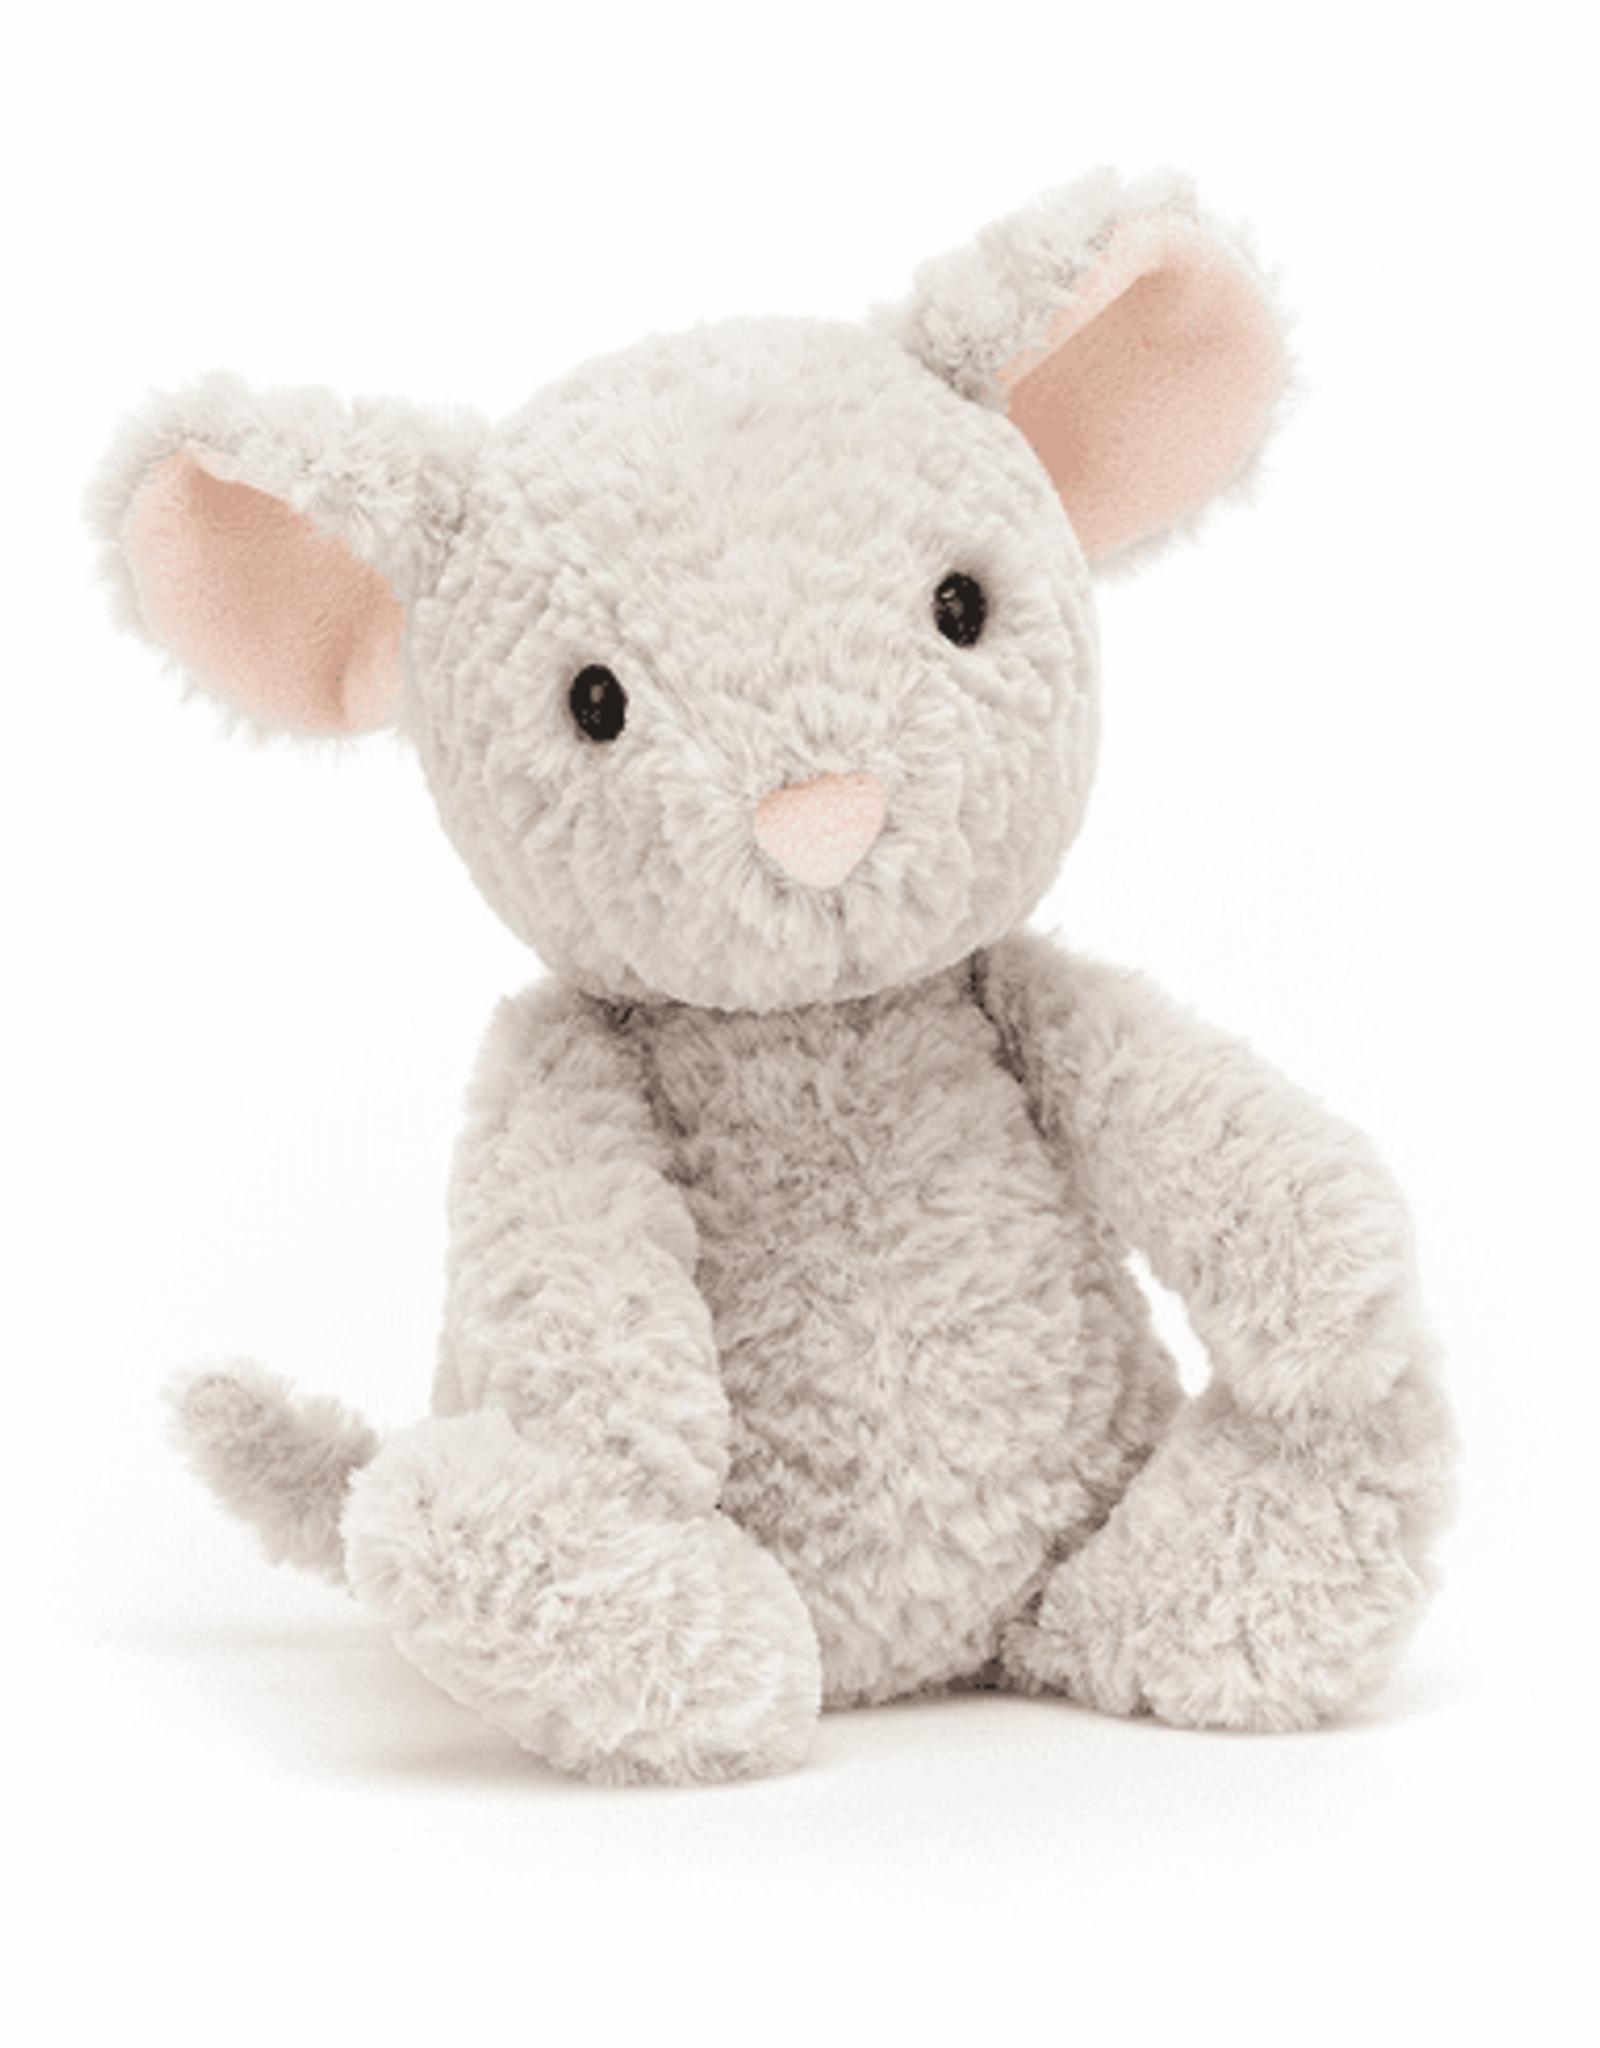 Jellycat tumbletuft mouse